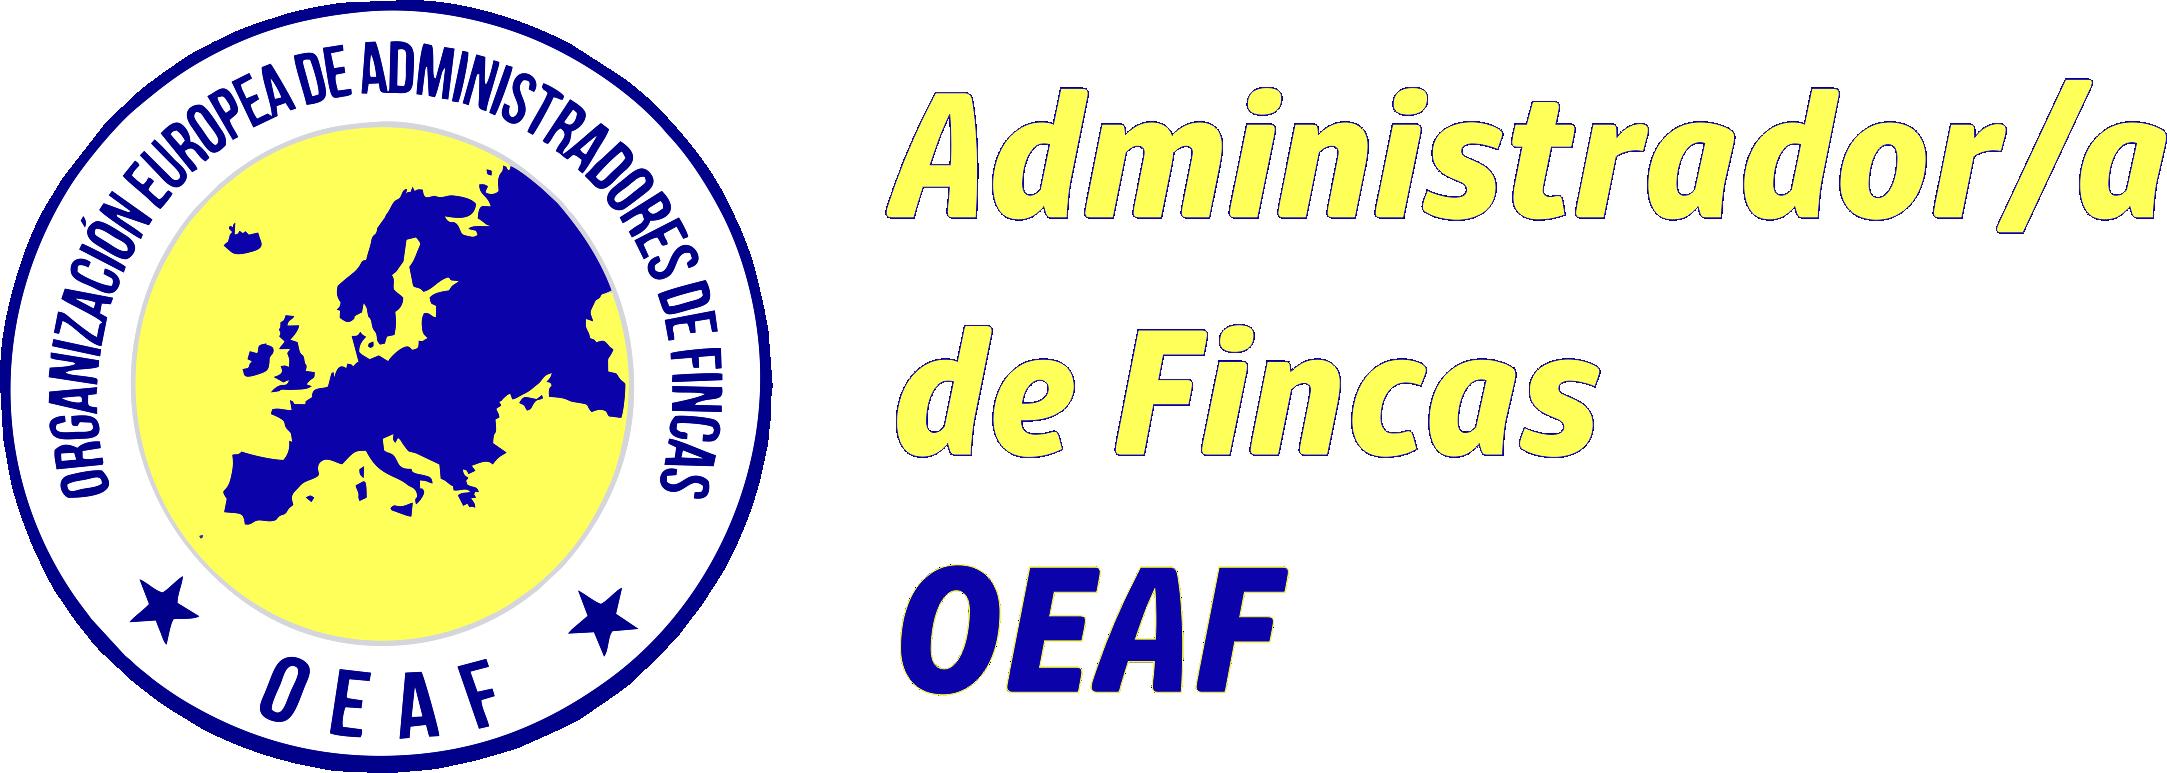 Foto de Administrador/a de Fincas OEAF